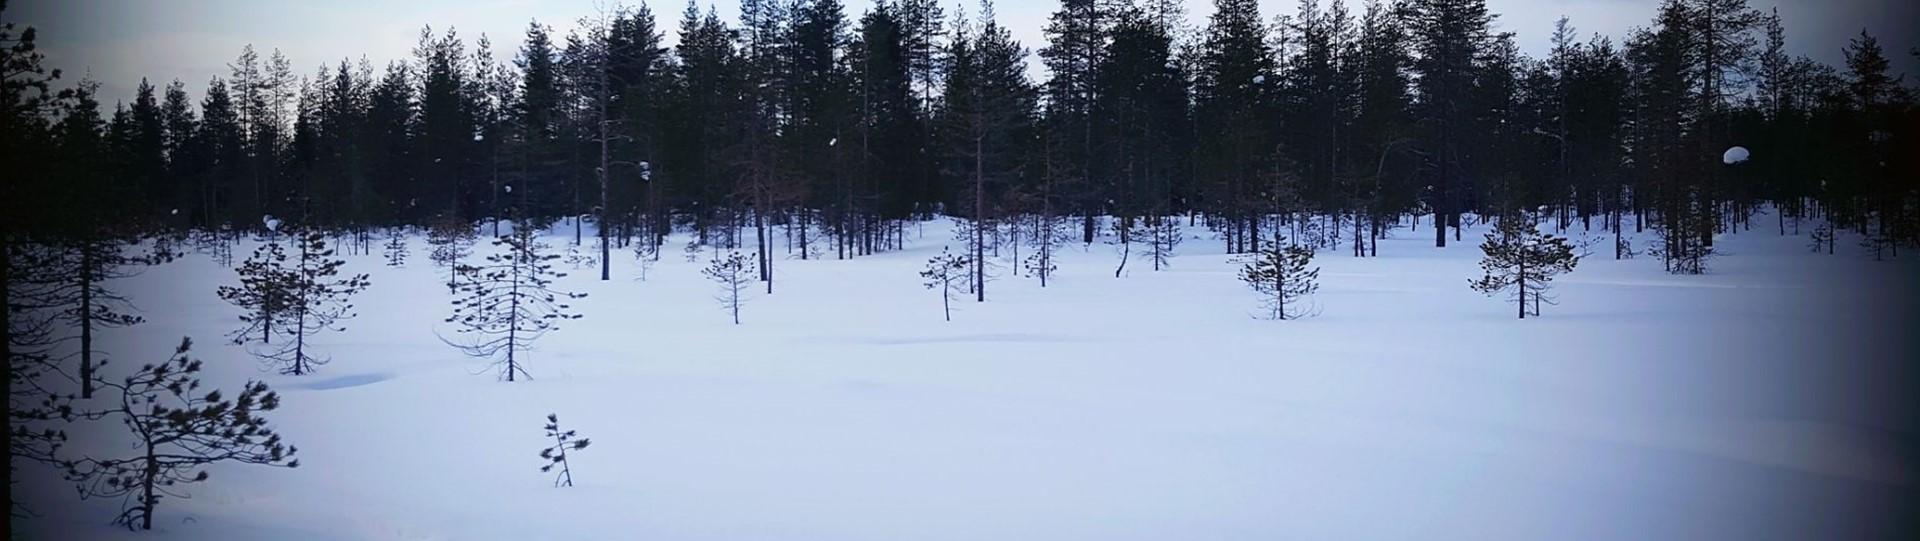 Reisverslag Winters Lapland